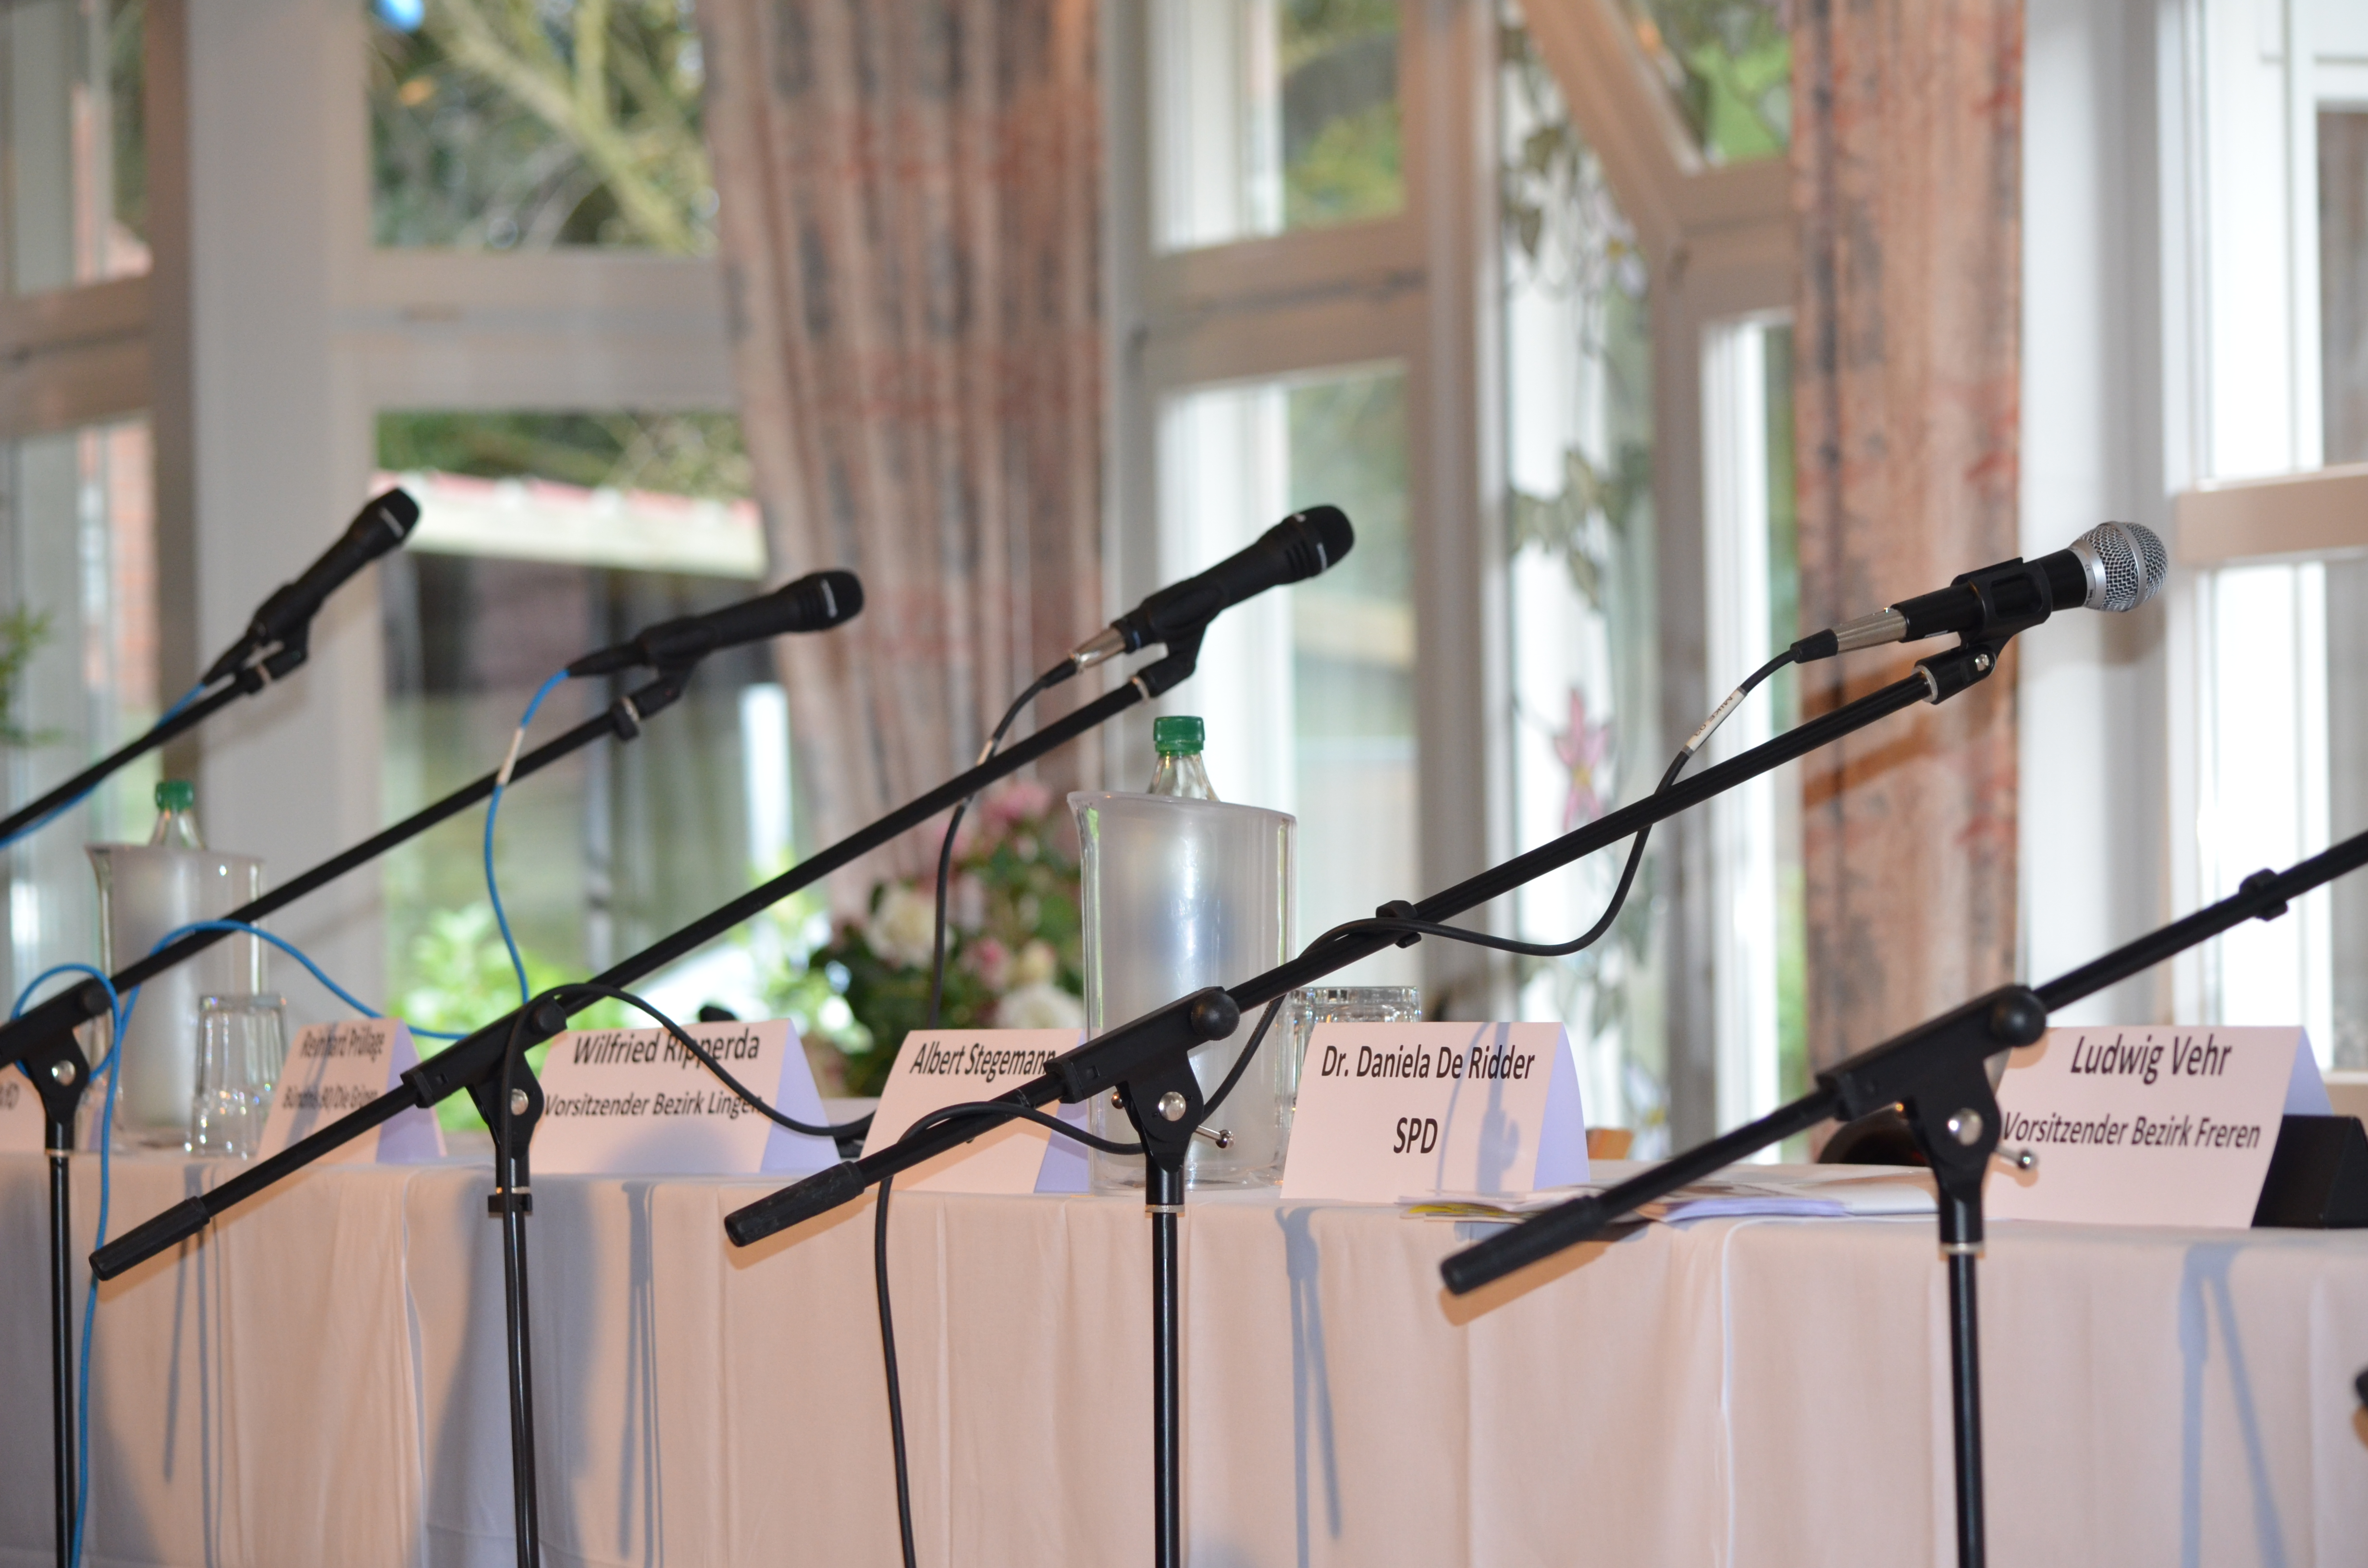 Dr. Daniela De Ridder auf dem Podium des Kolpingwerkes